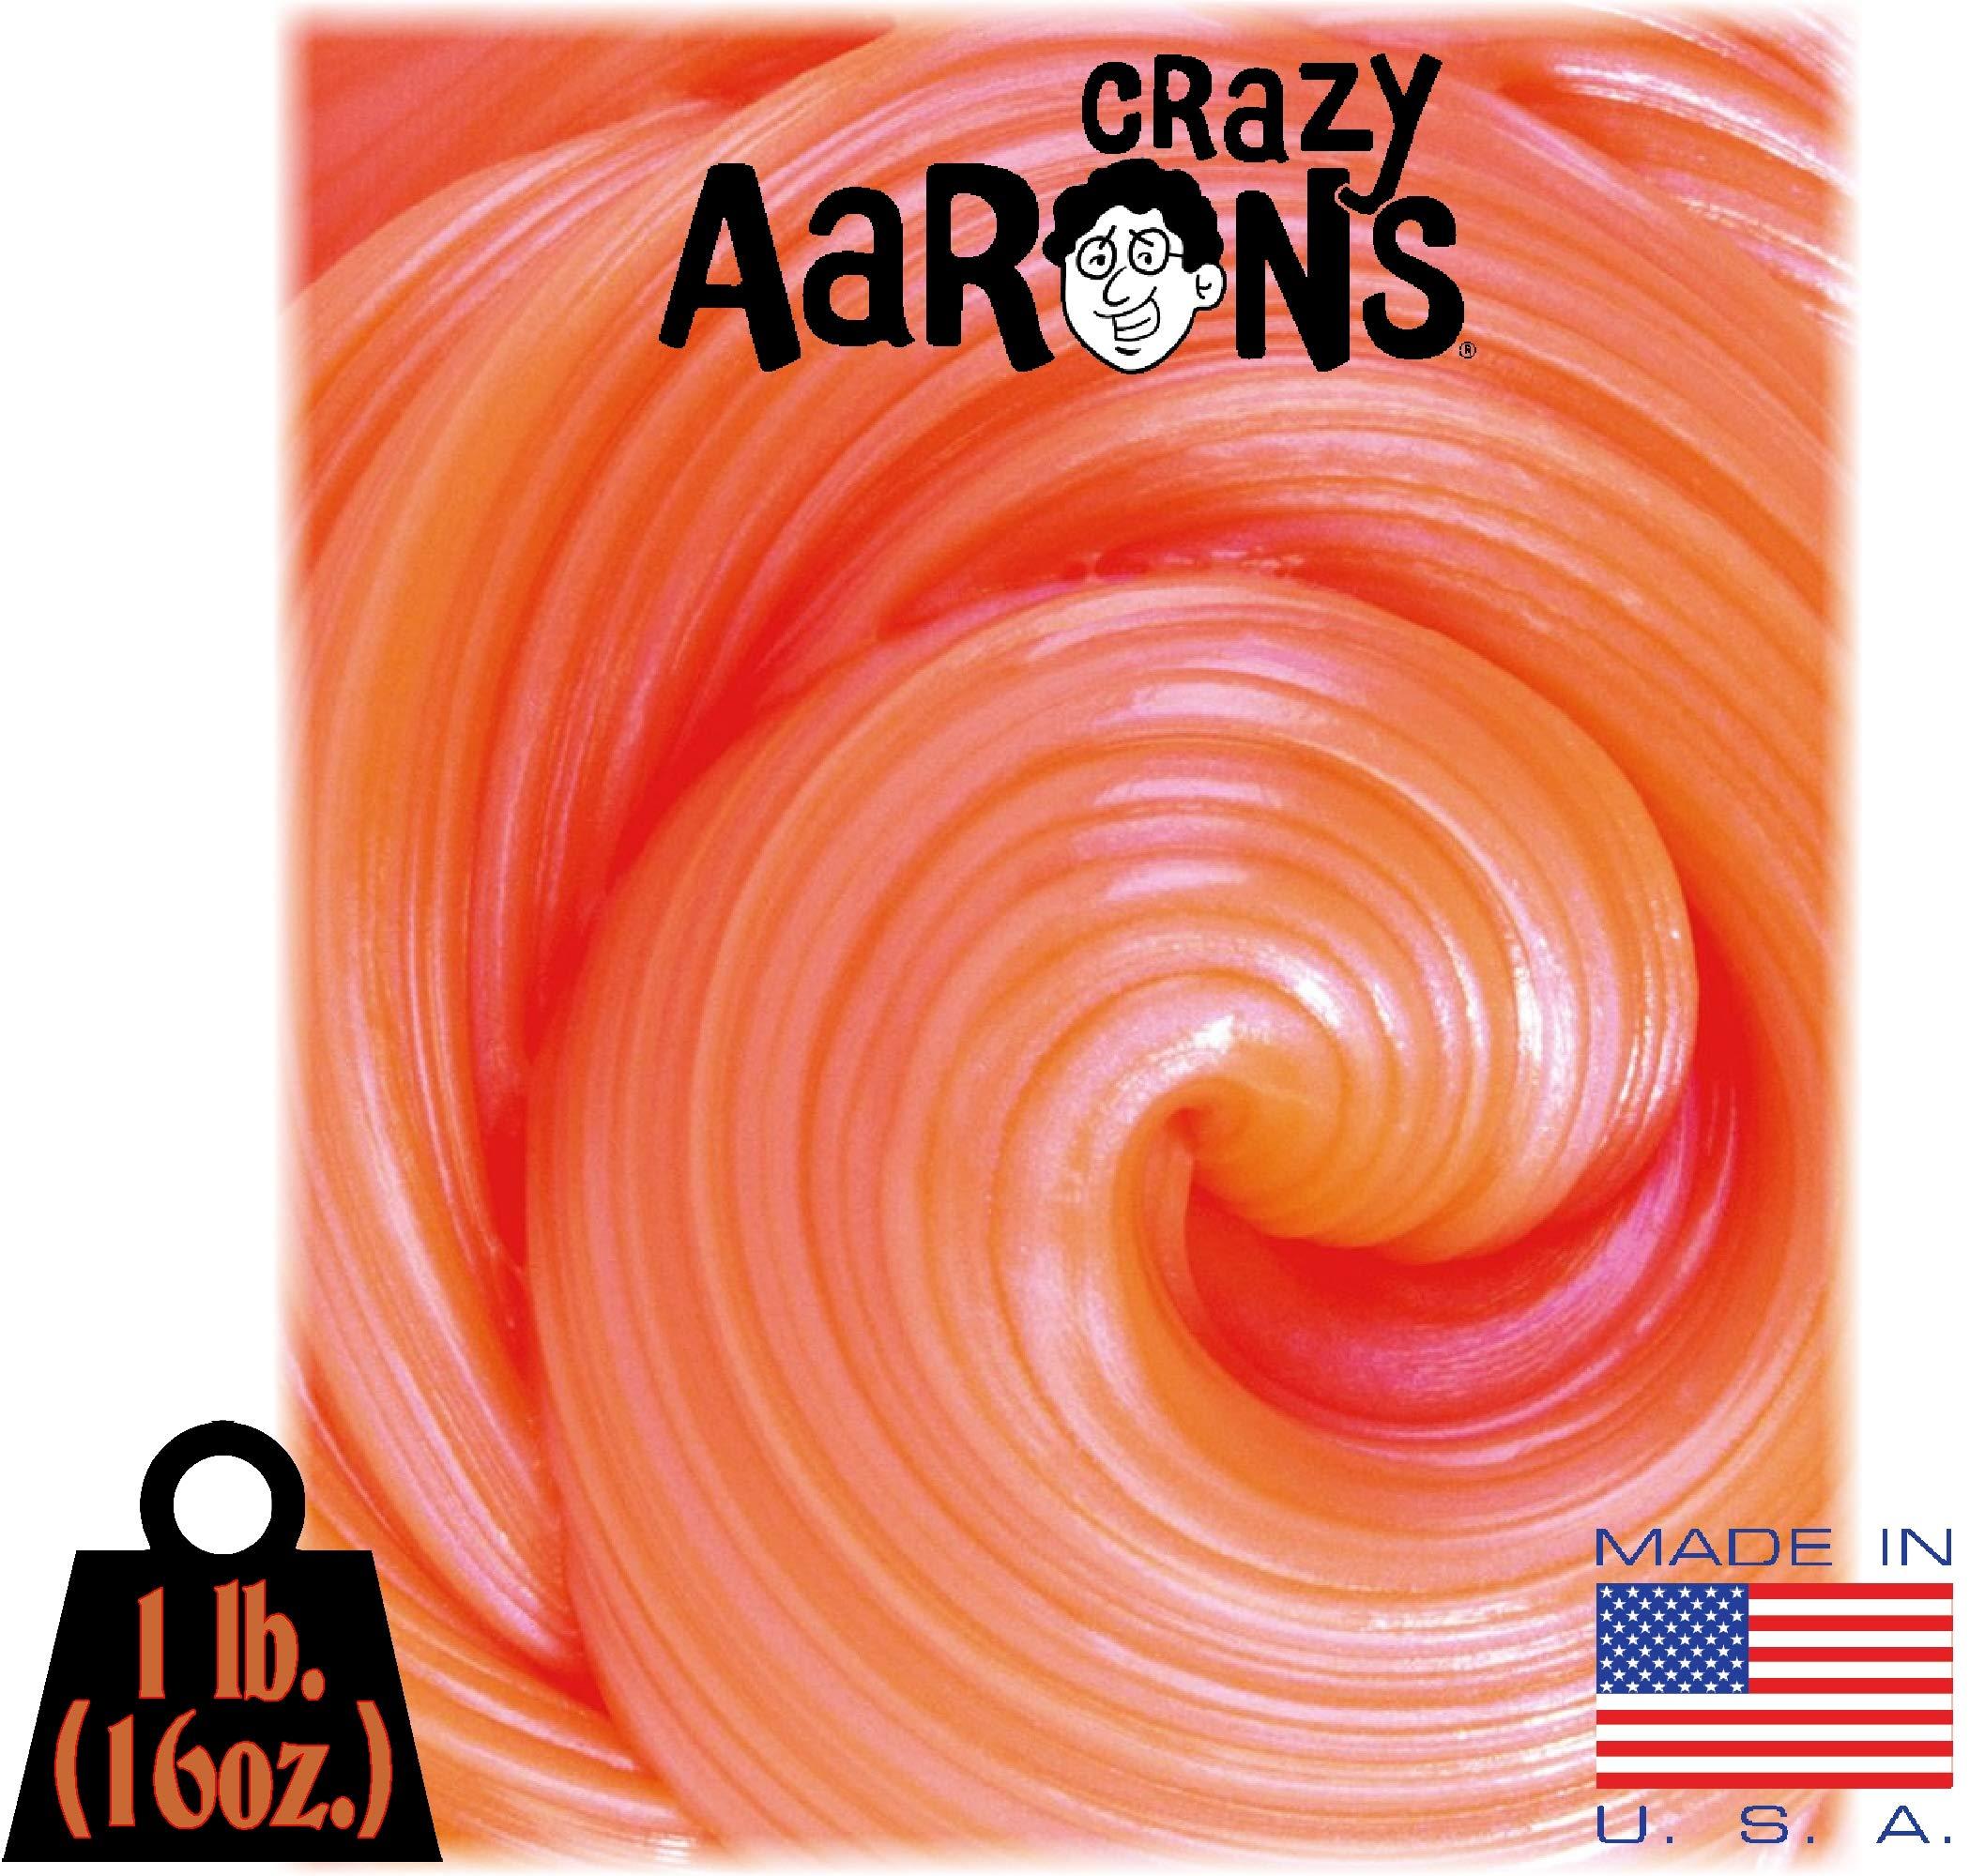 Crazy Aaron's Electric Thinking Putty MEGA Tin Neon Flash - 1 Pound (.16oz) by Crazy Aaron's (Image #2)